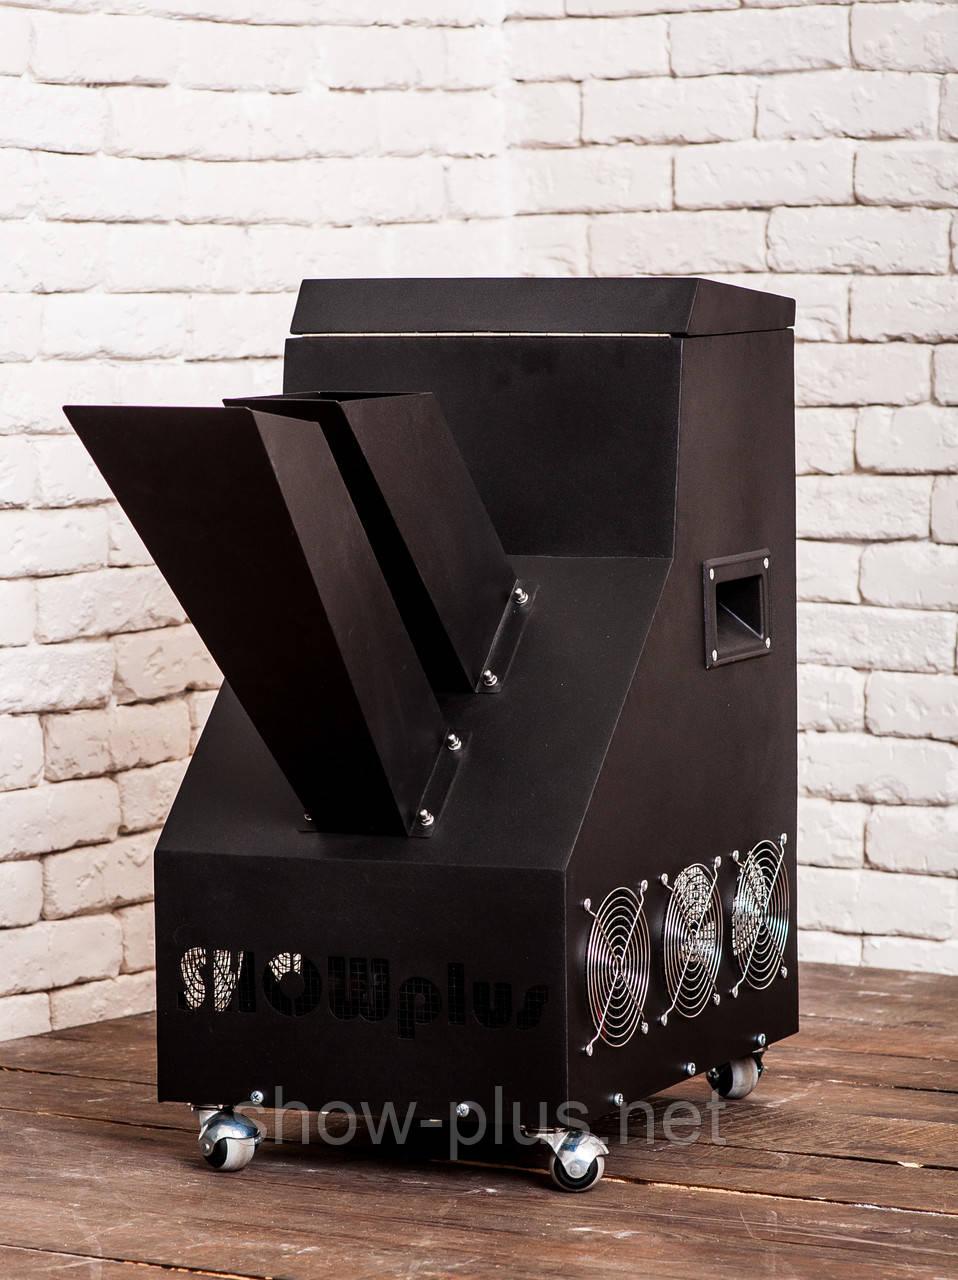 Конфетти машина, конфетти пушка, генератор конфетти SHOWplus СМ-1000 от производителя